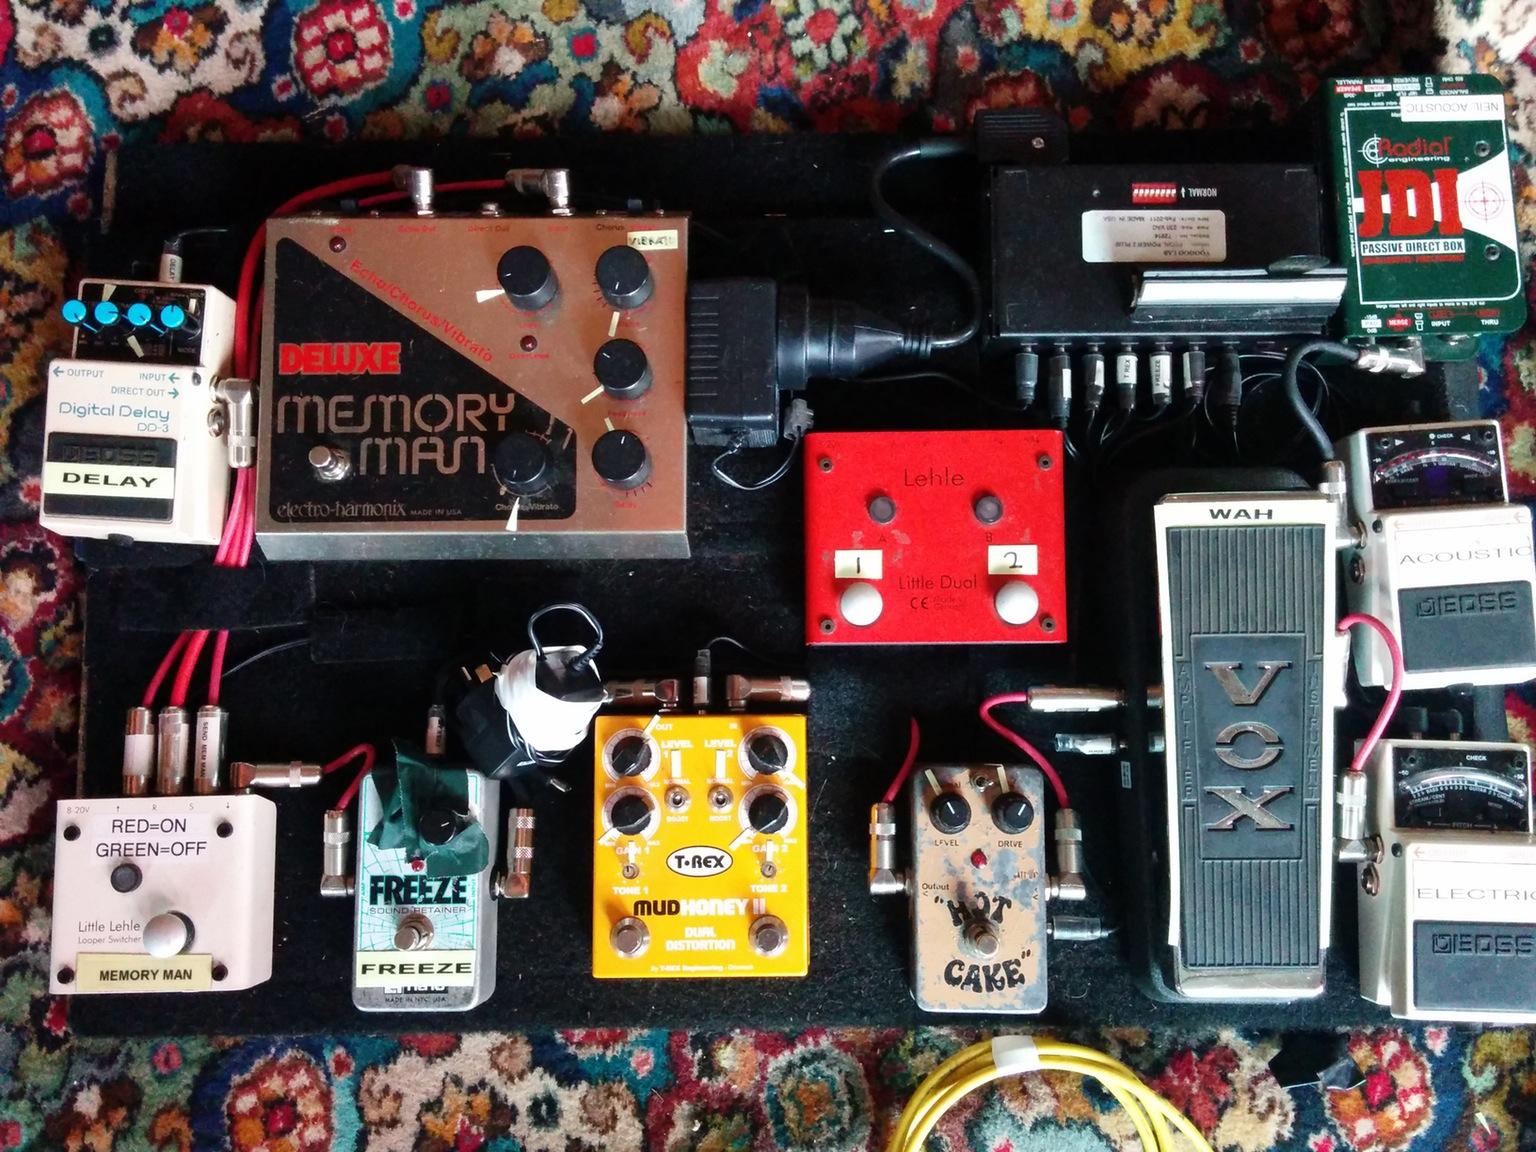 Electro Harmonix Deluxe Memory Man Delay Pedal With Chorus And Vibrato